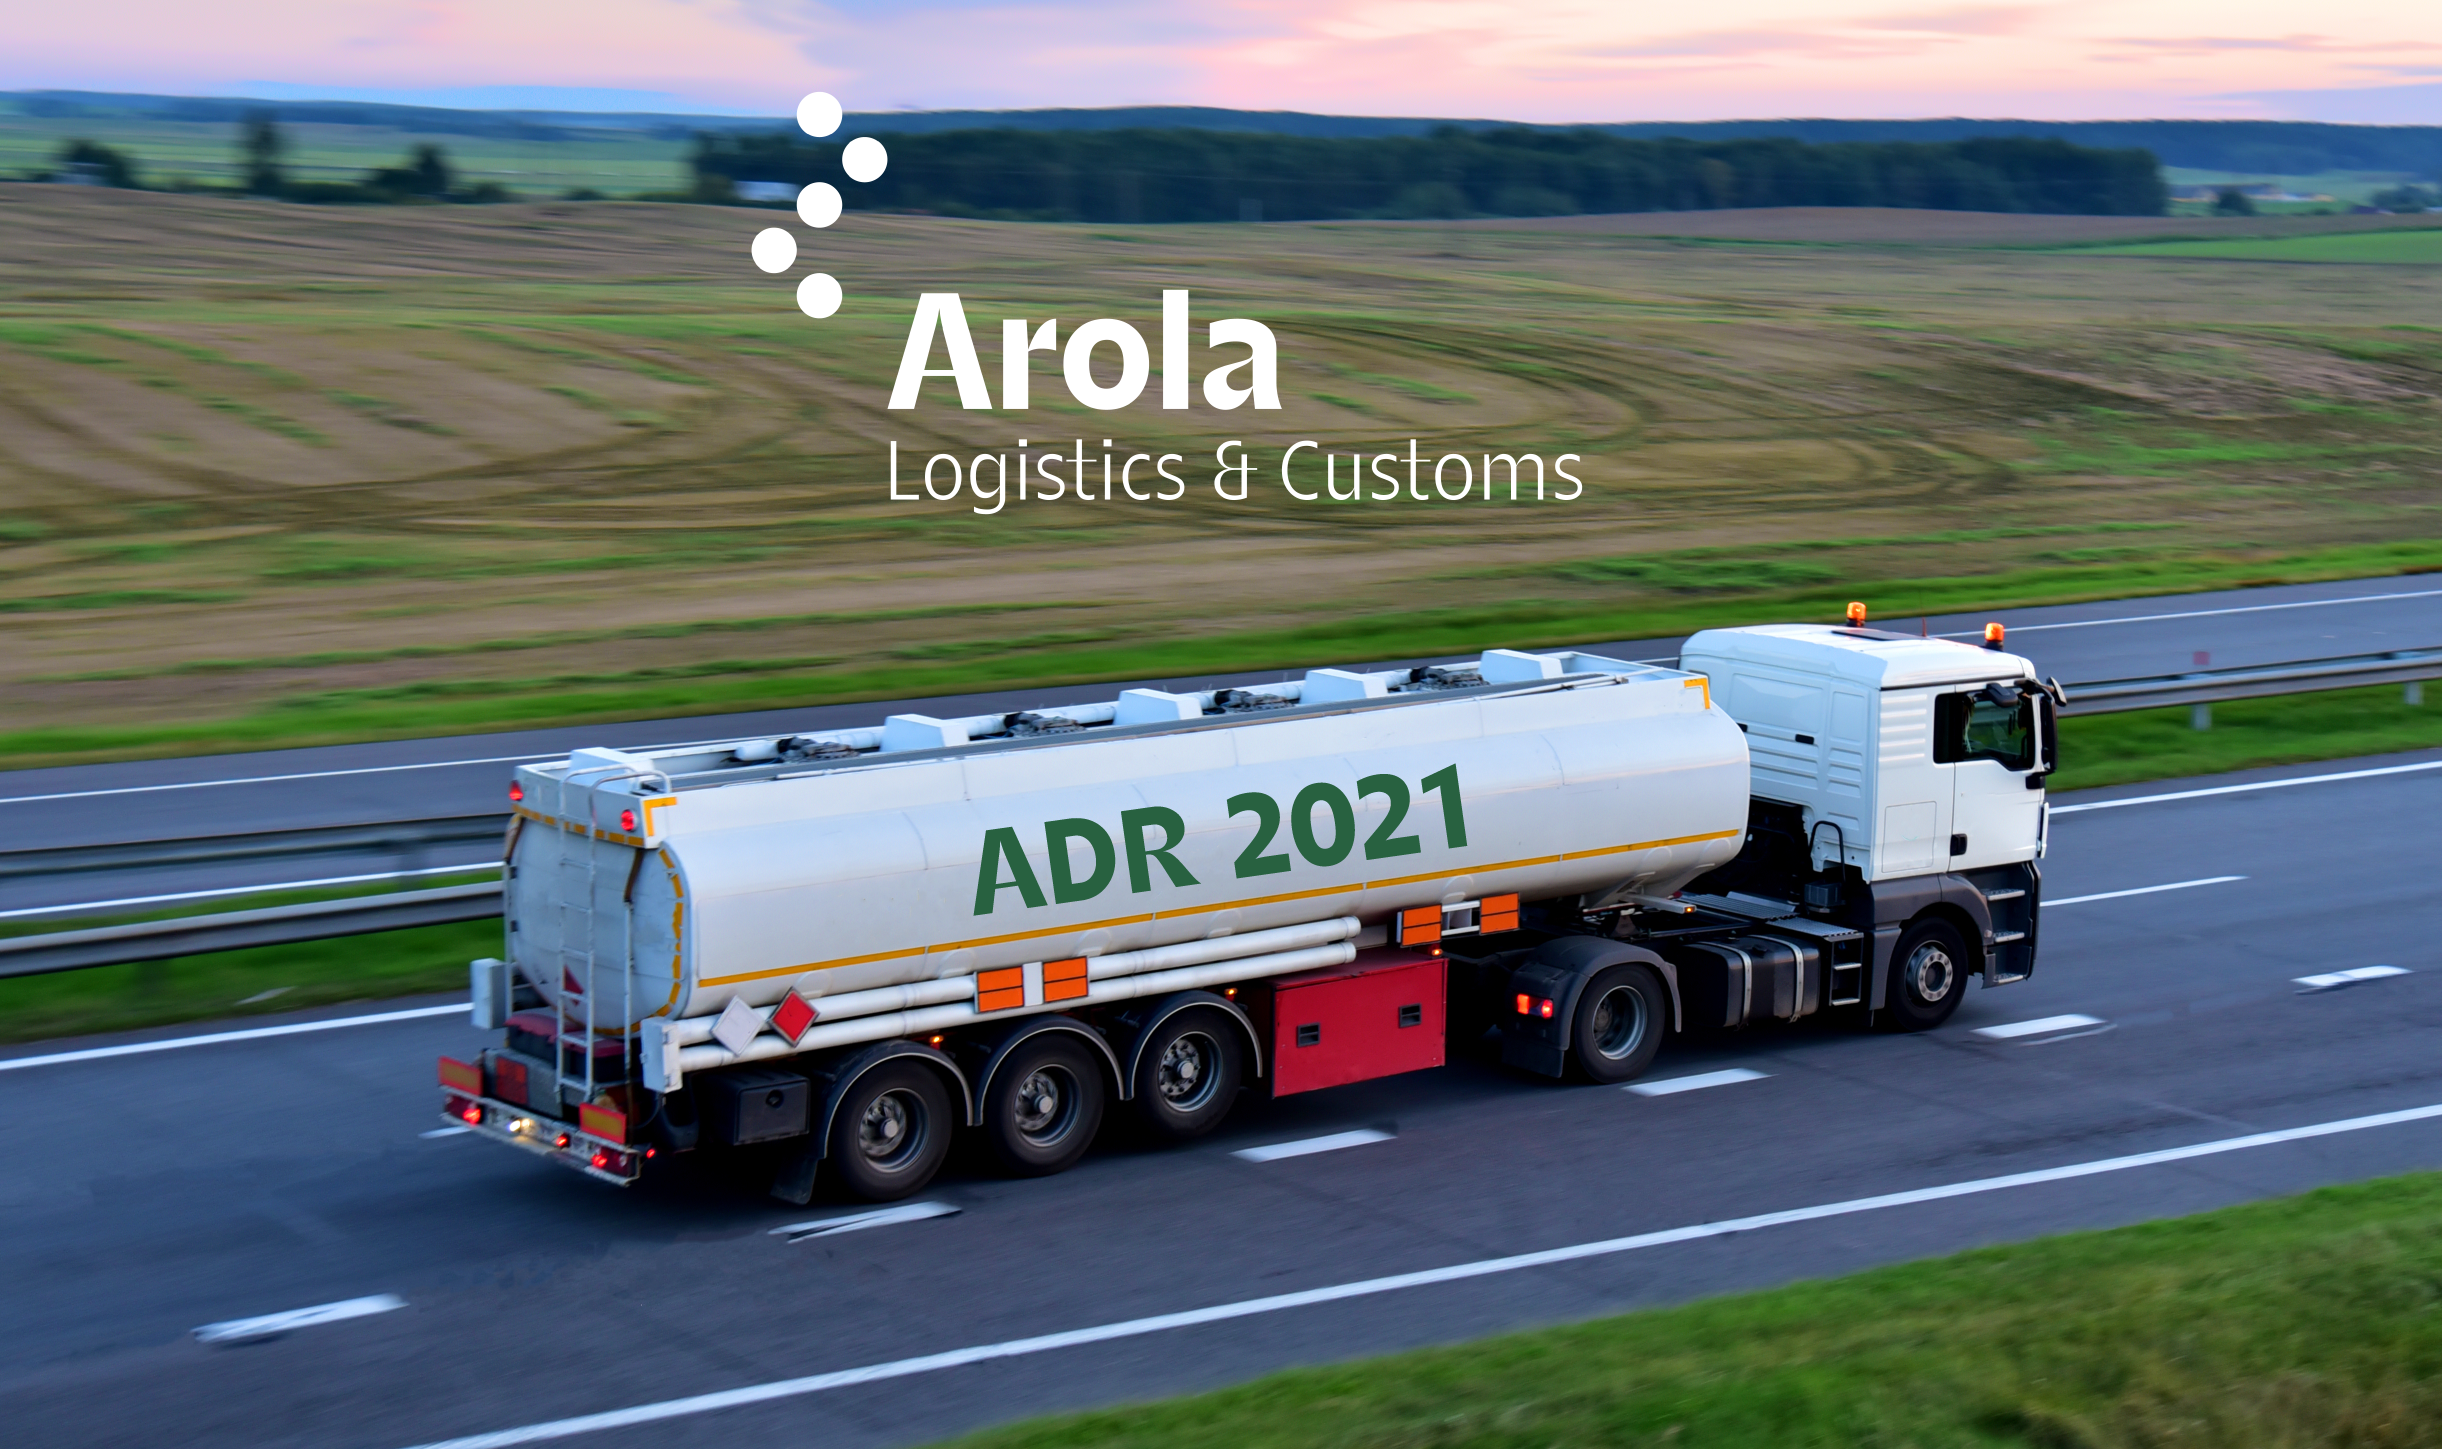 Transporte internacional de mercancías peligrosas por carretera ADR 2021